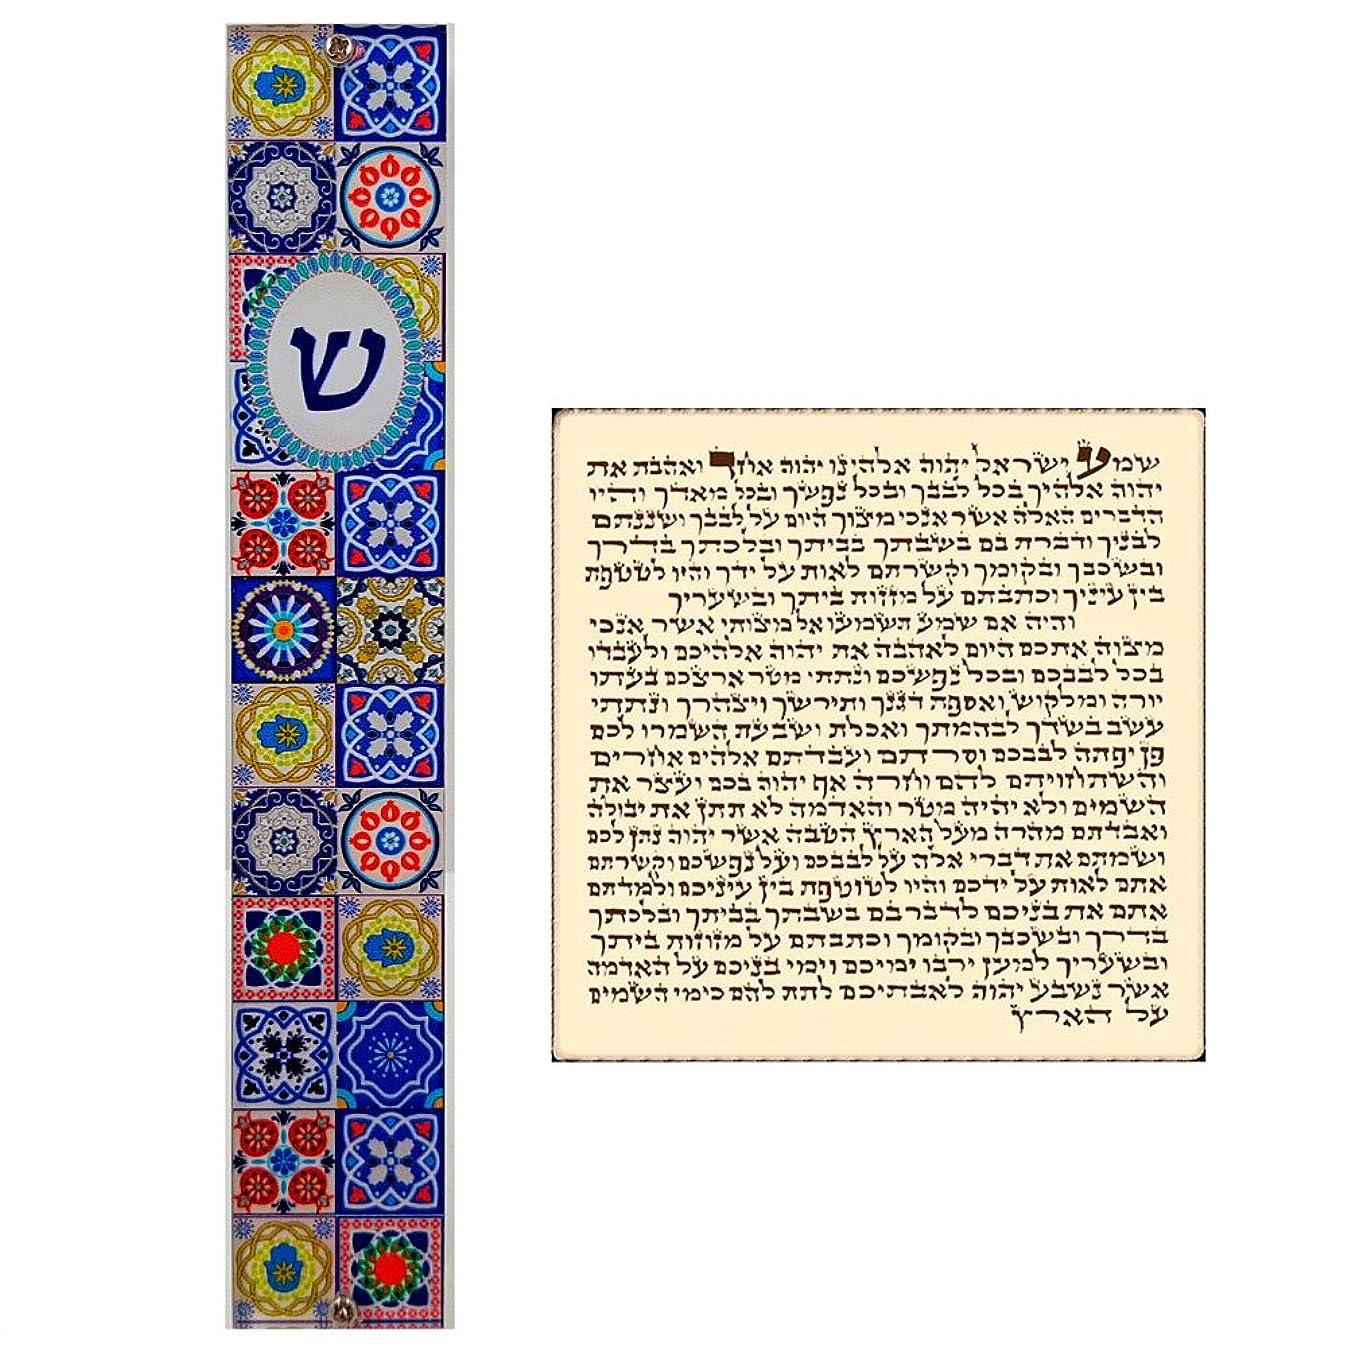 Talisman4U Jewish MEZUZAH CASE with Prayer Scroll Hebrew Parchment Multicolor Mosaic Design Art Judaica Gift Door Mezuza Made in Israel 5